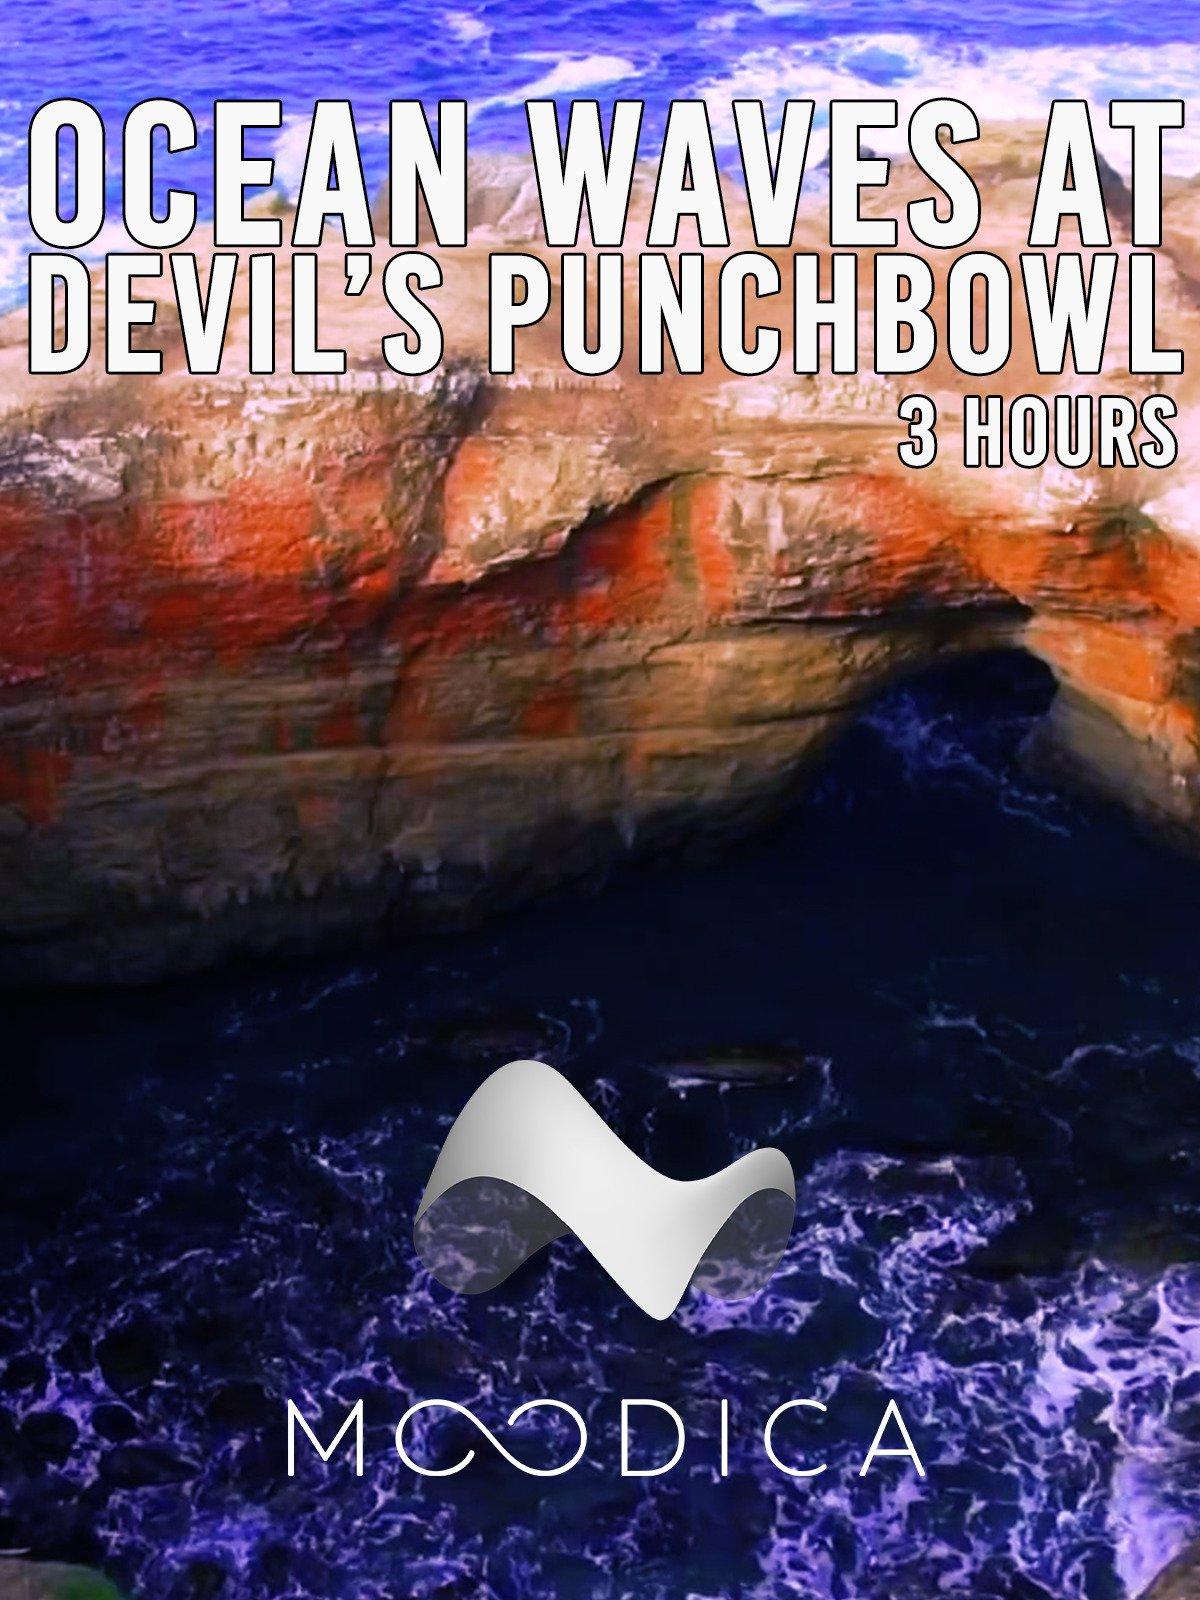 3 Hours: Ocean Waves At Devil's Punchbowl